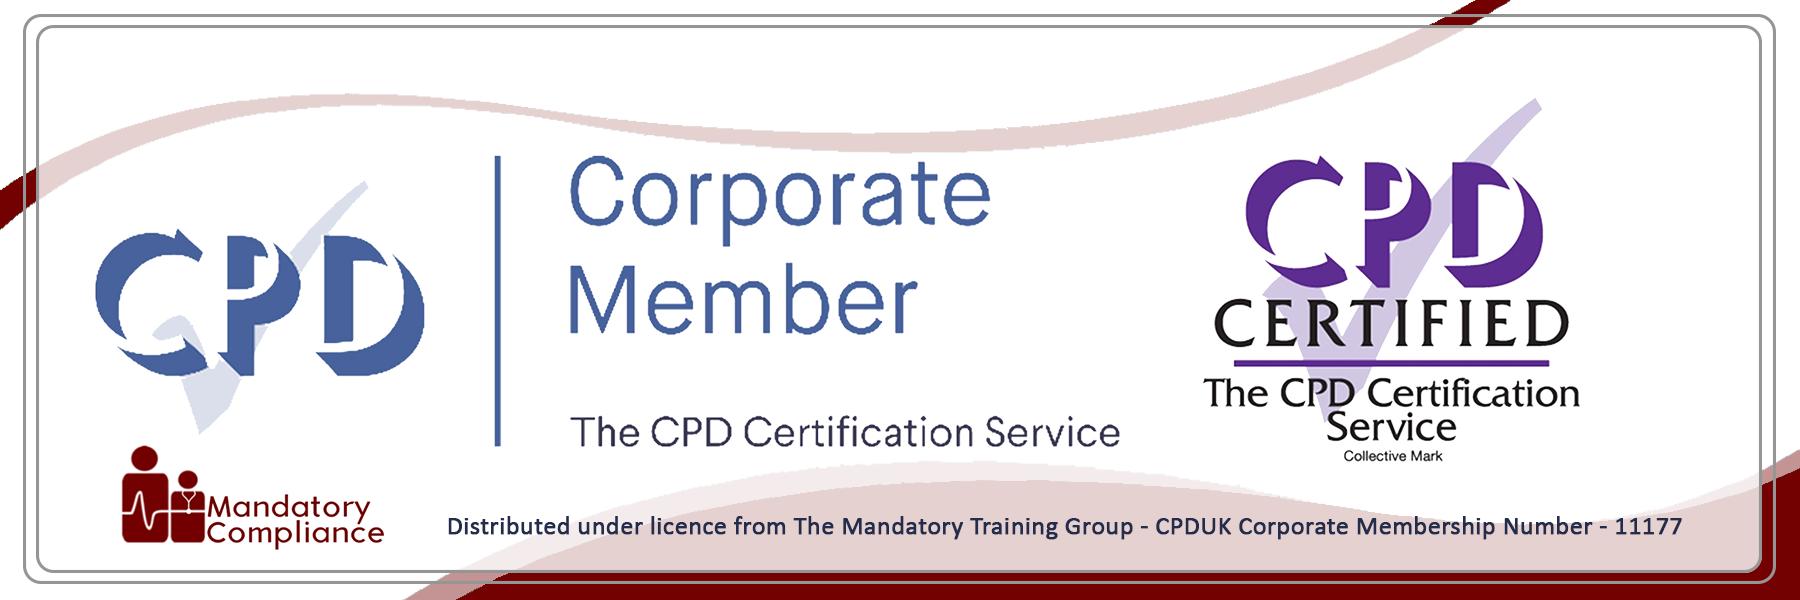 Middle Manager Training - Online Training Course - CPDUK Accredited - Mandatory Compliance UK -